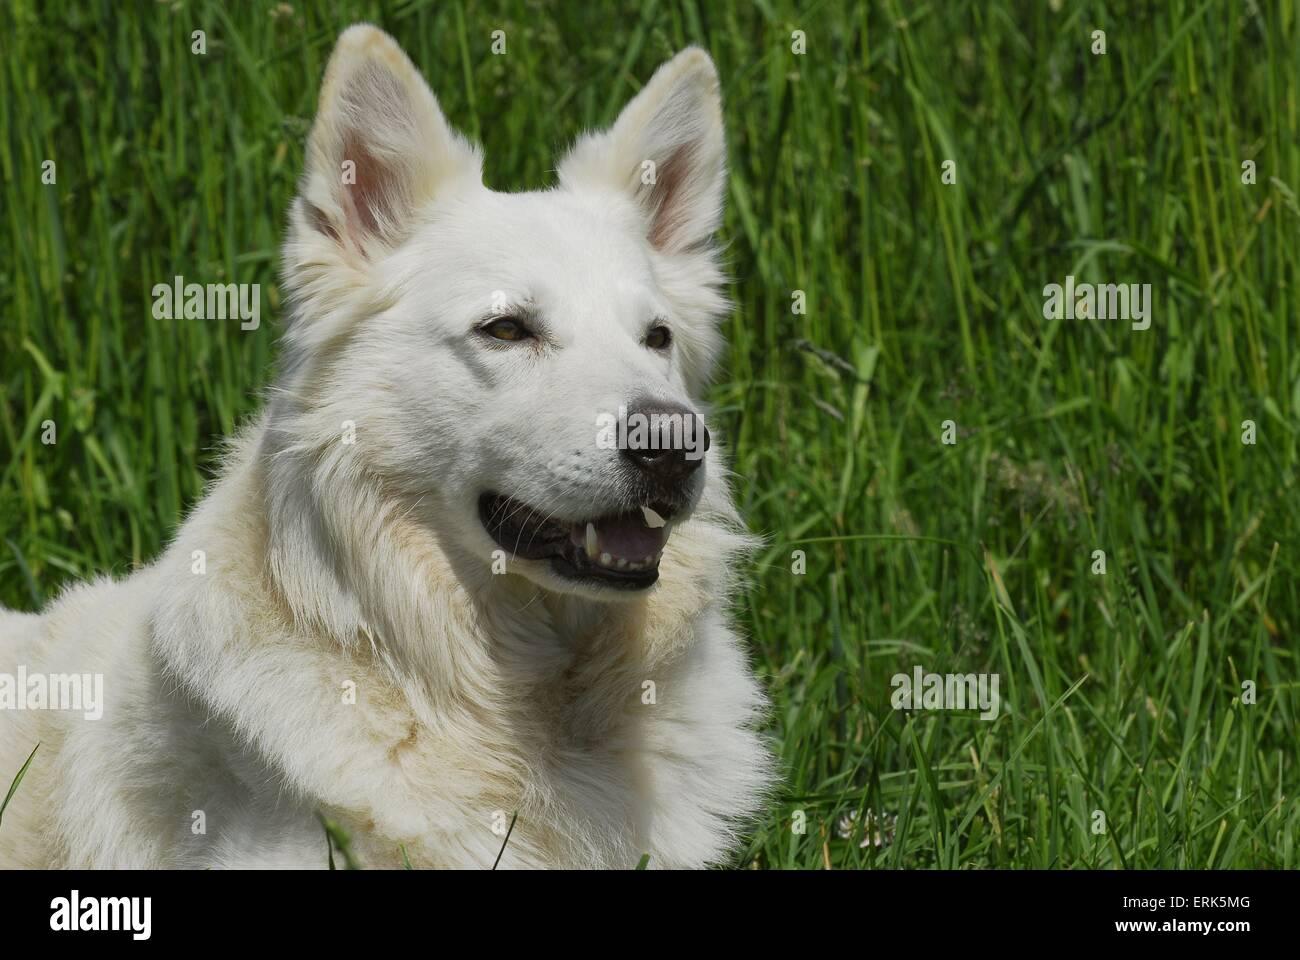 white shepherd - Stock Image